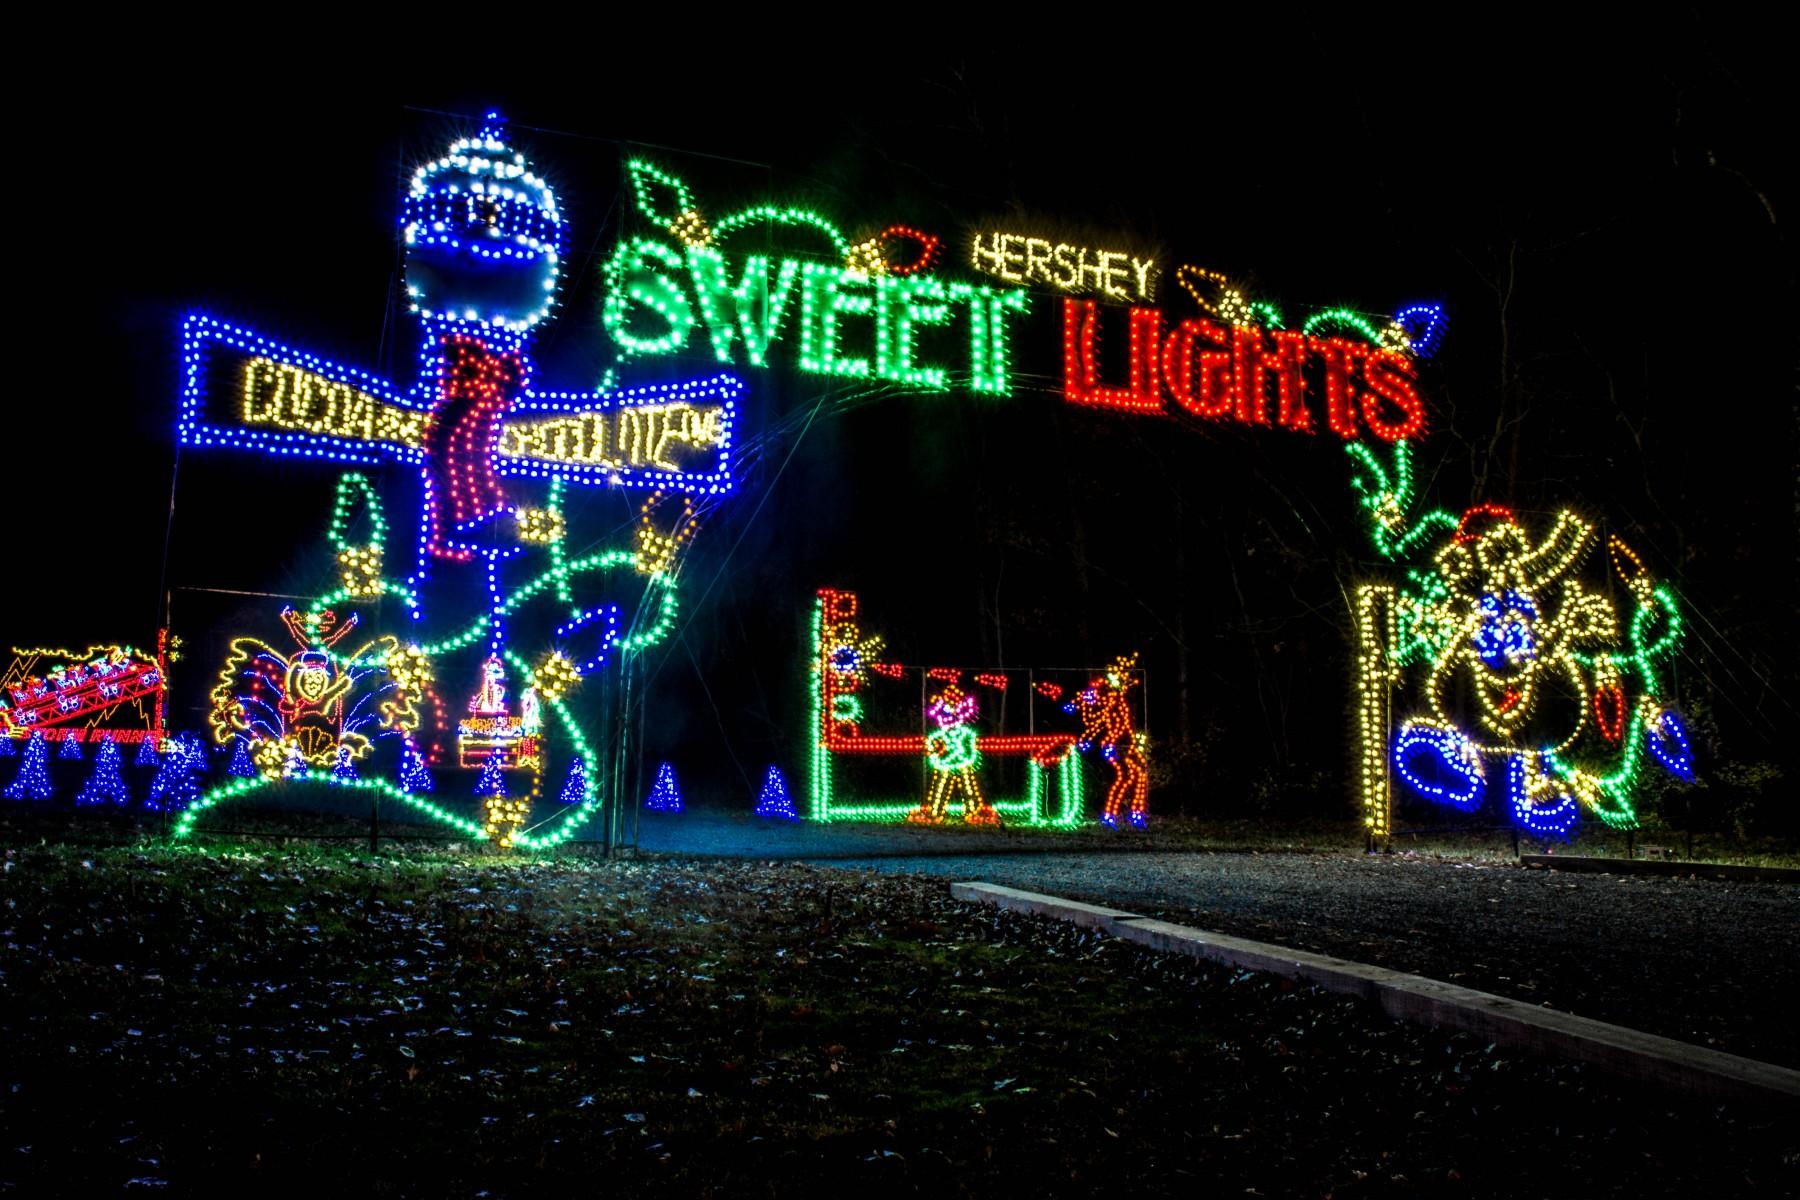 Hershey Sweet Lights is a Must-See | 1800 x 1200 jpeg 527kB